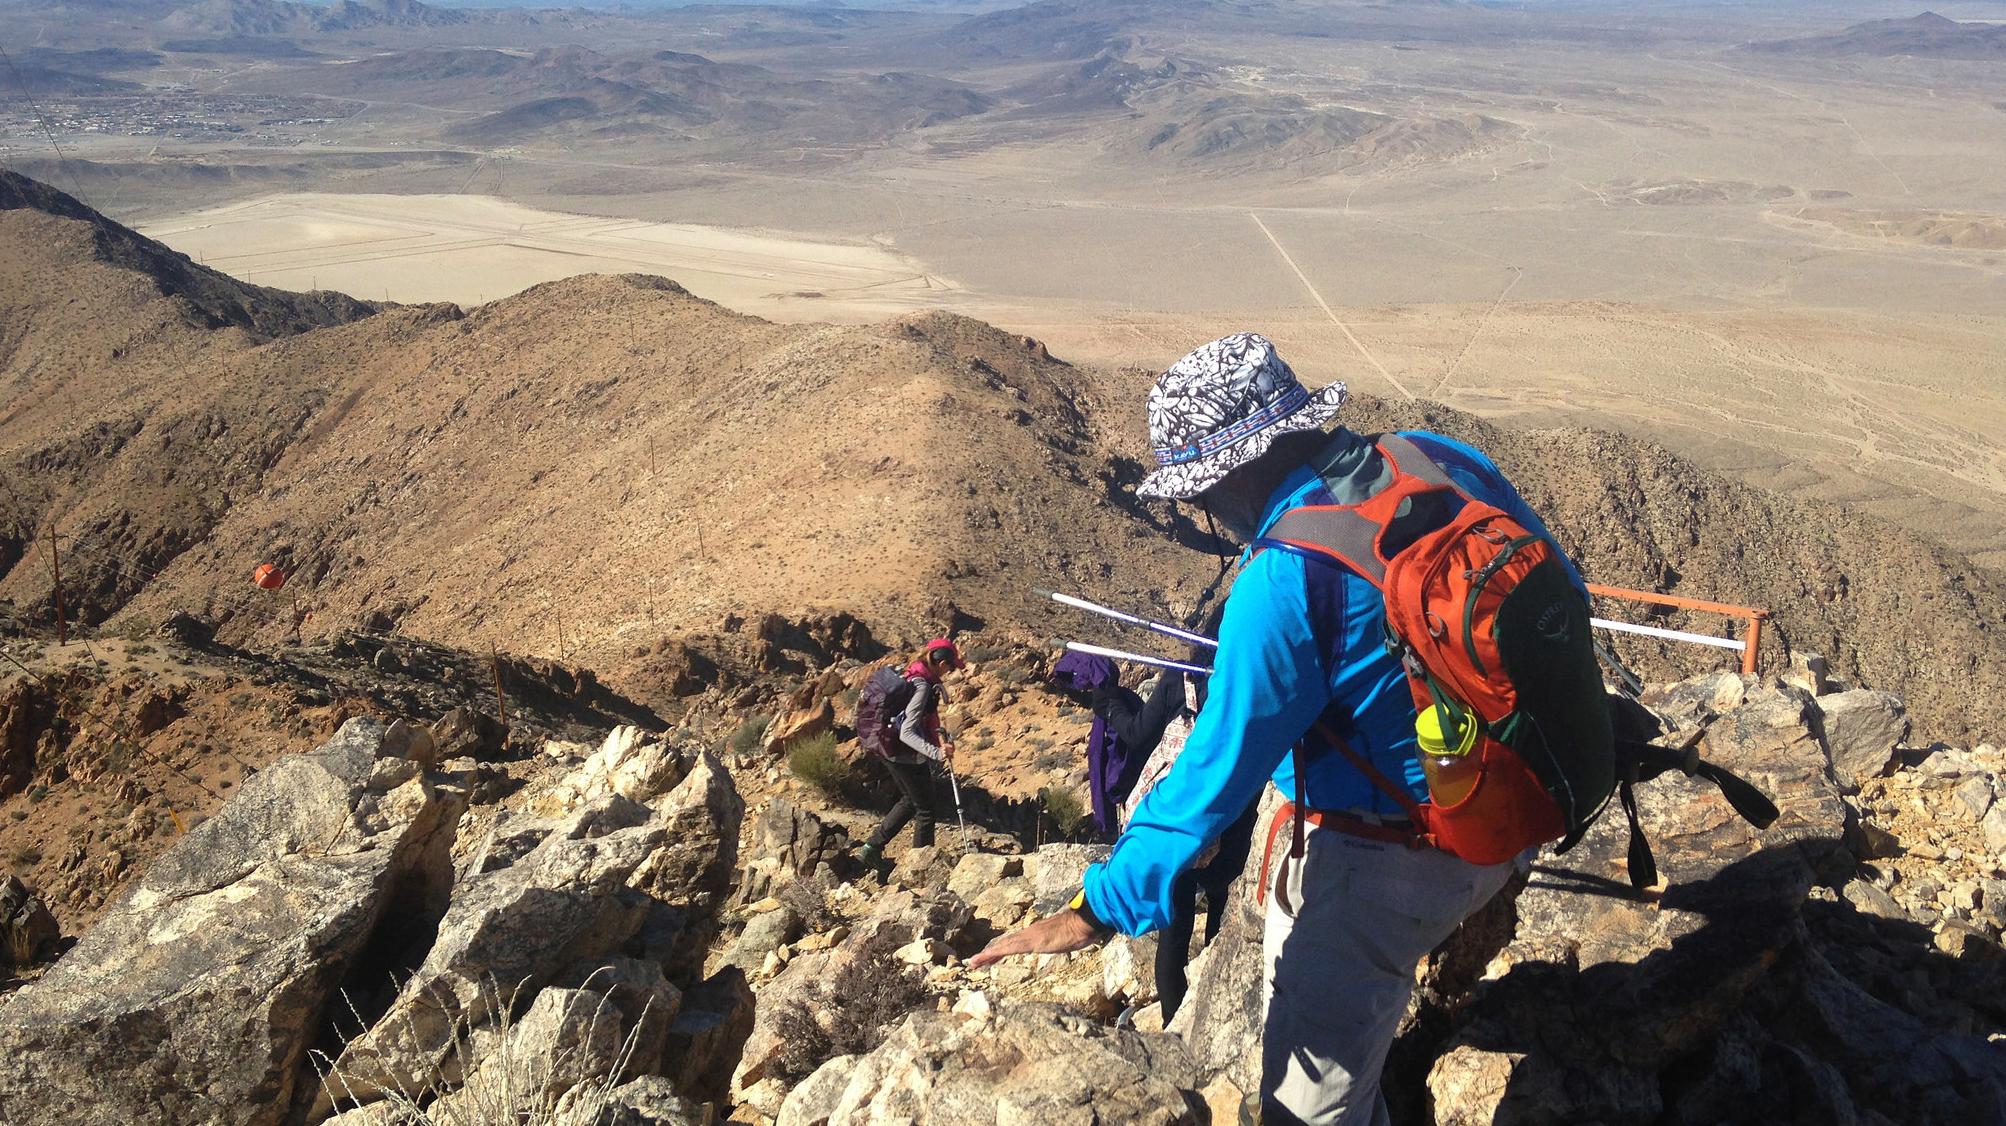 Tiefort Mountain Climb